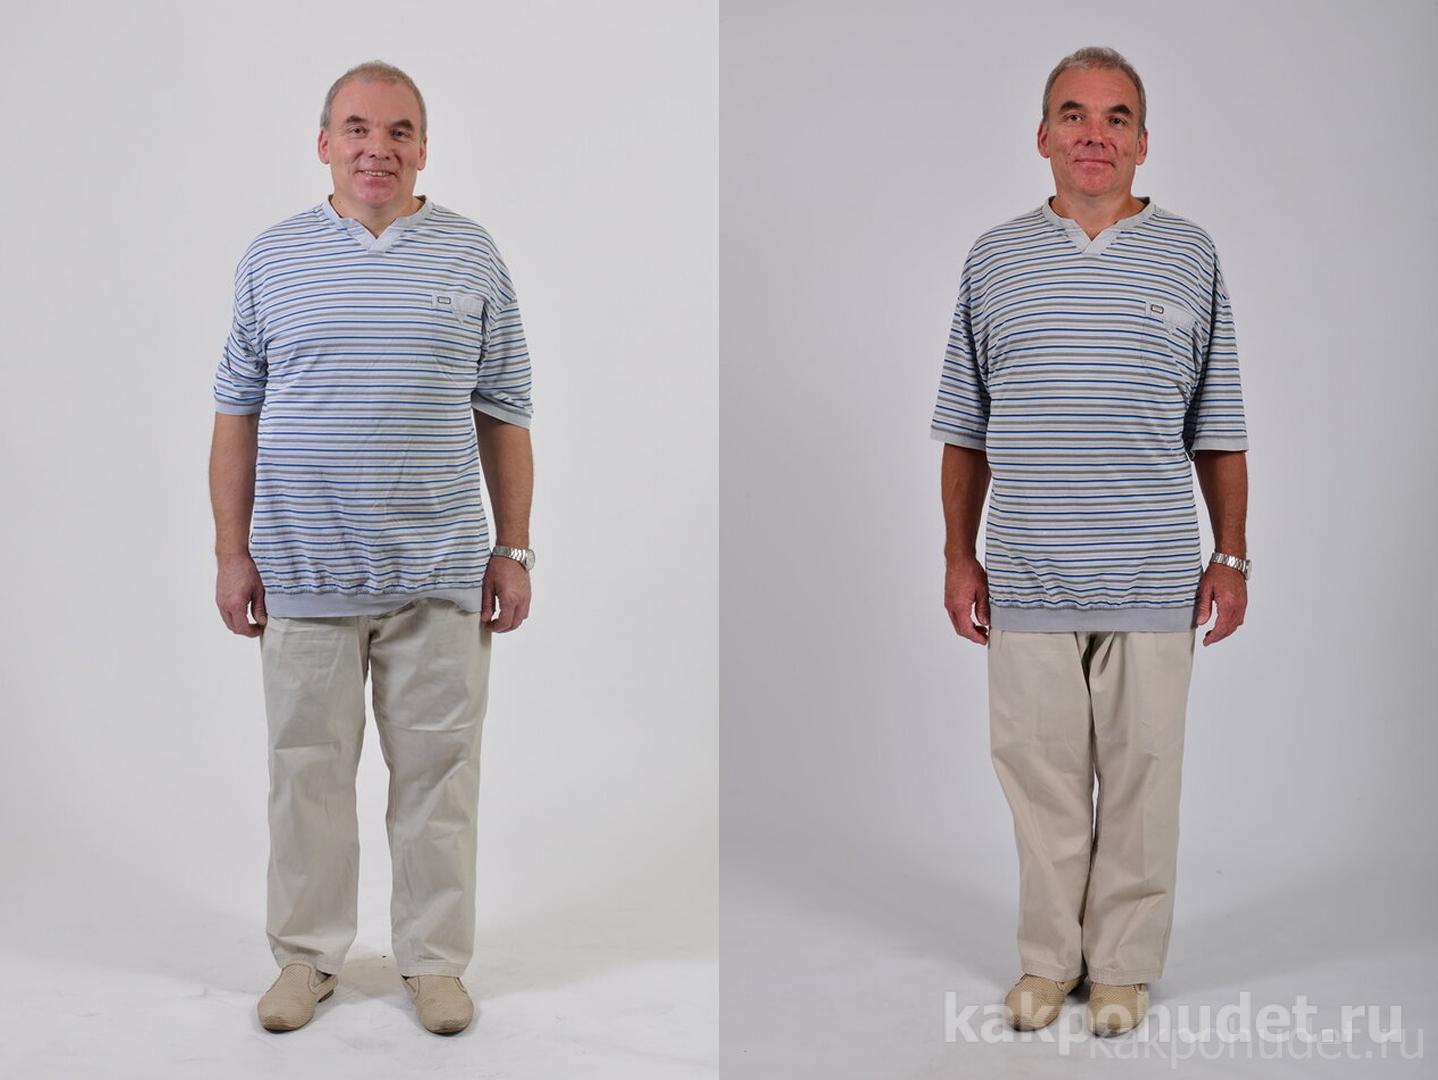 Минус 43 кг: он сам не ожидал такого результата!